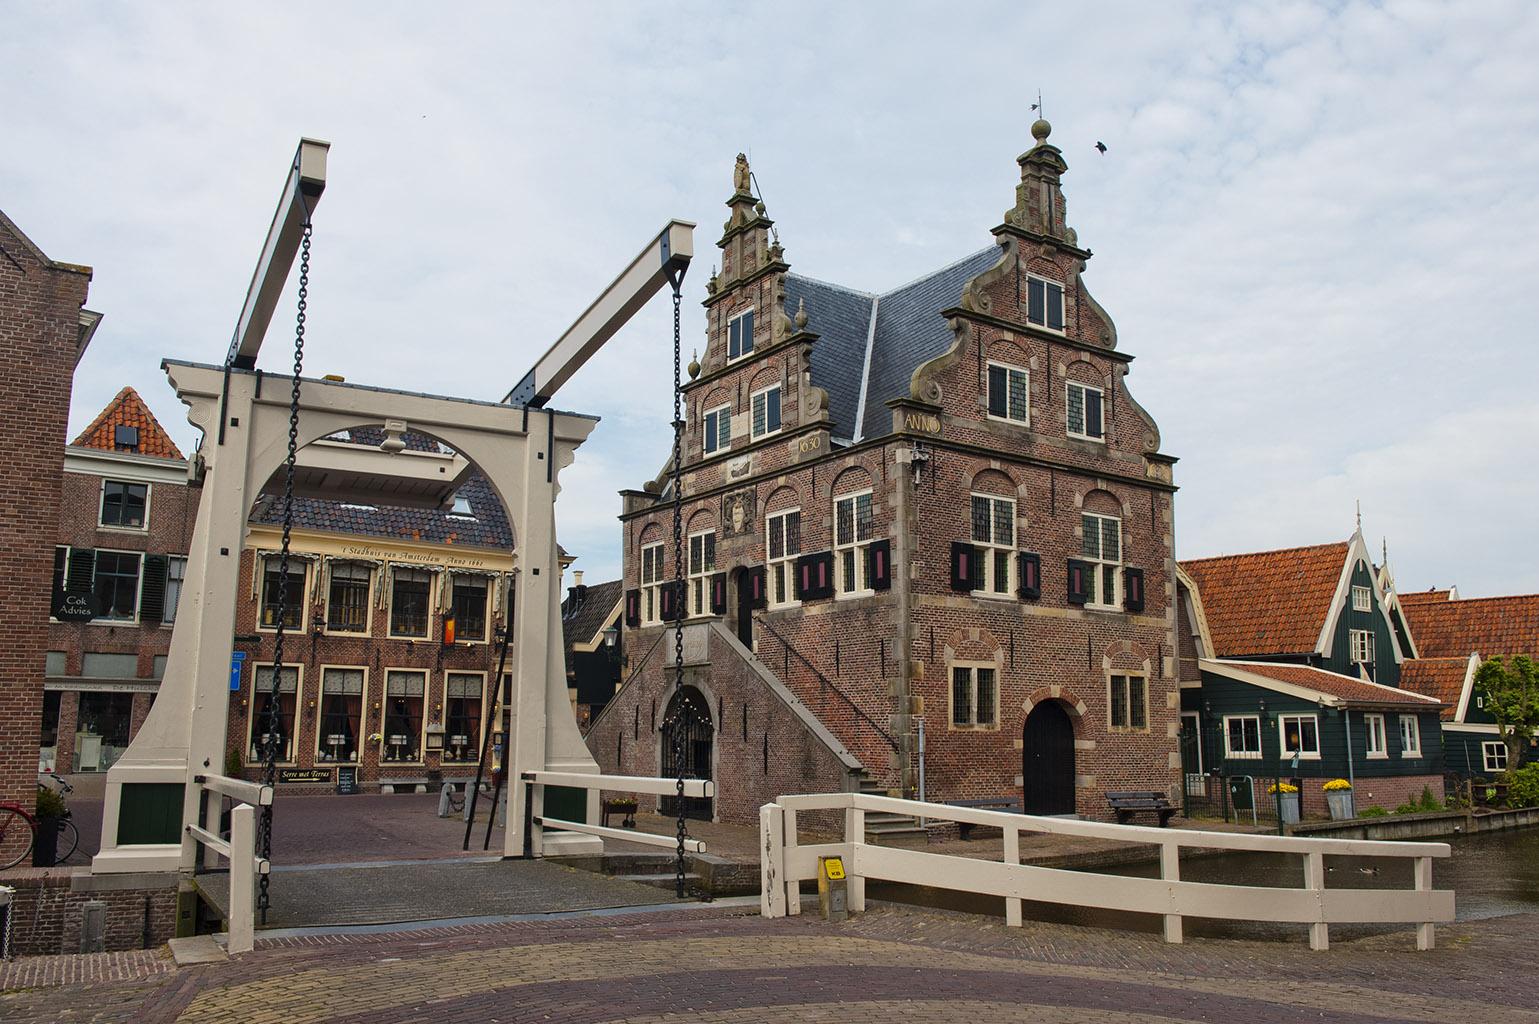 De Rijp, The Netherlands